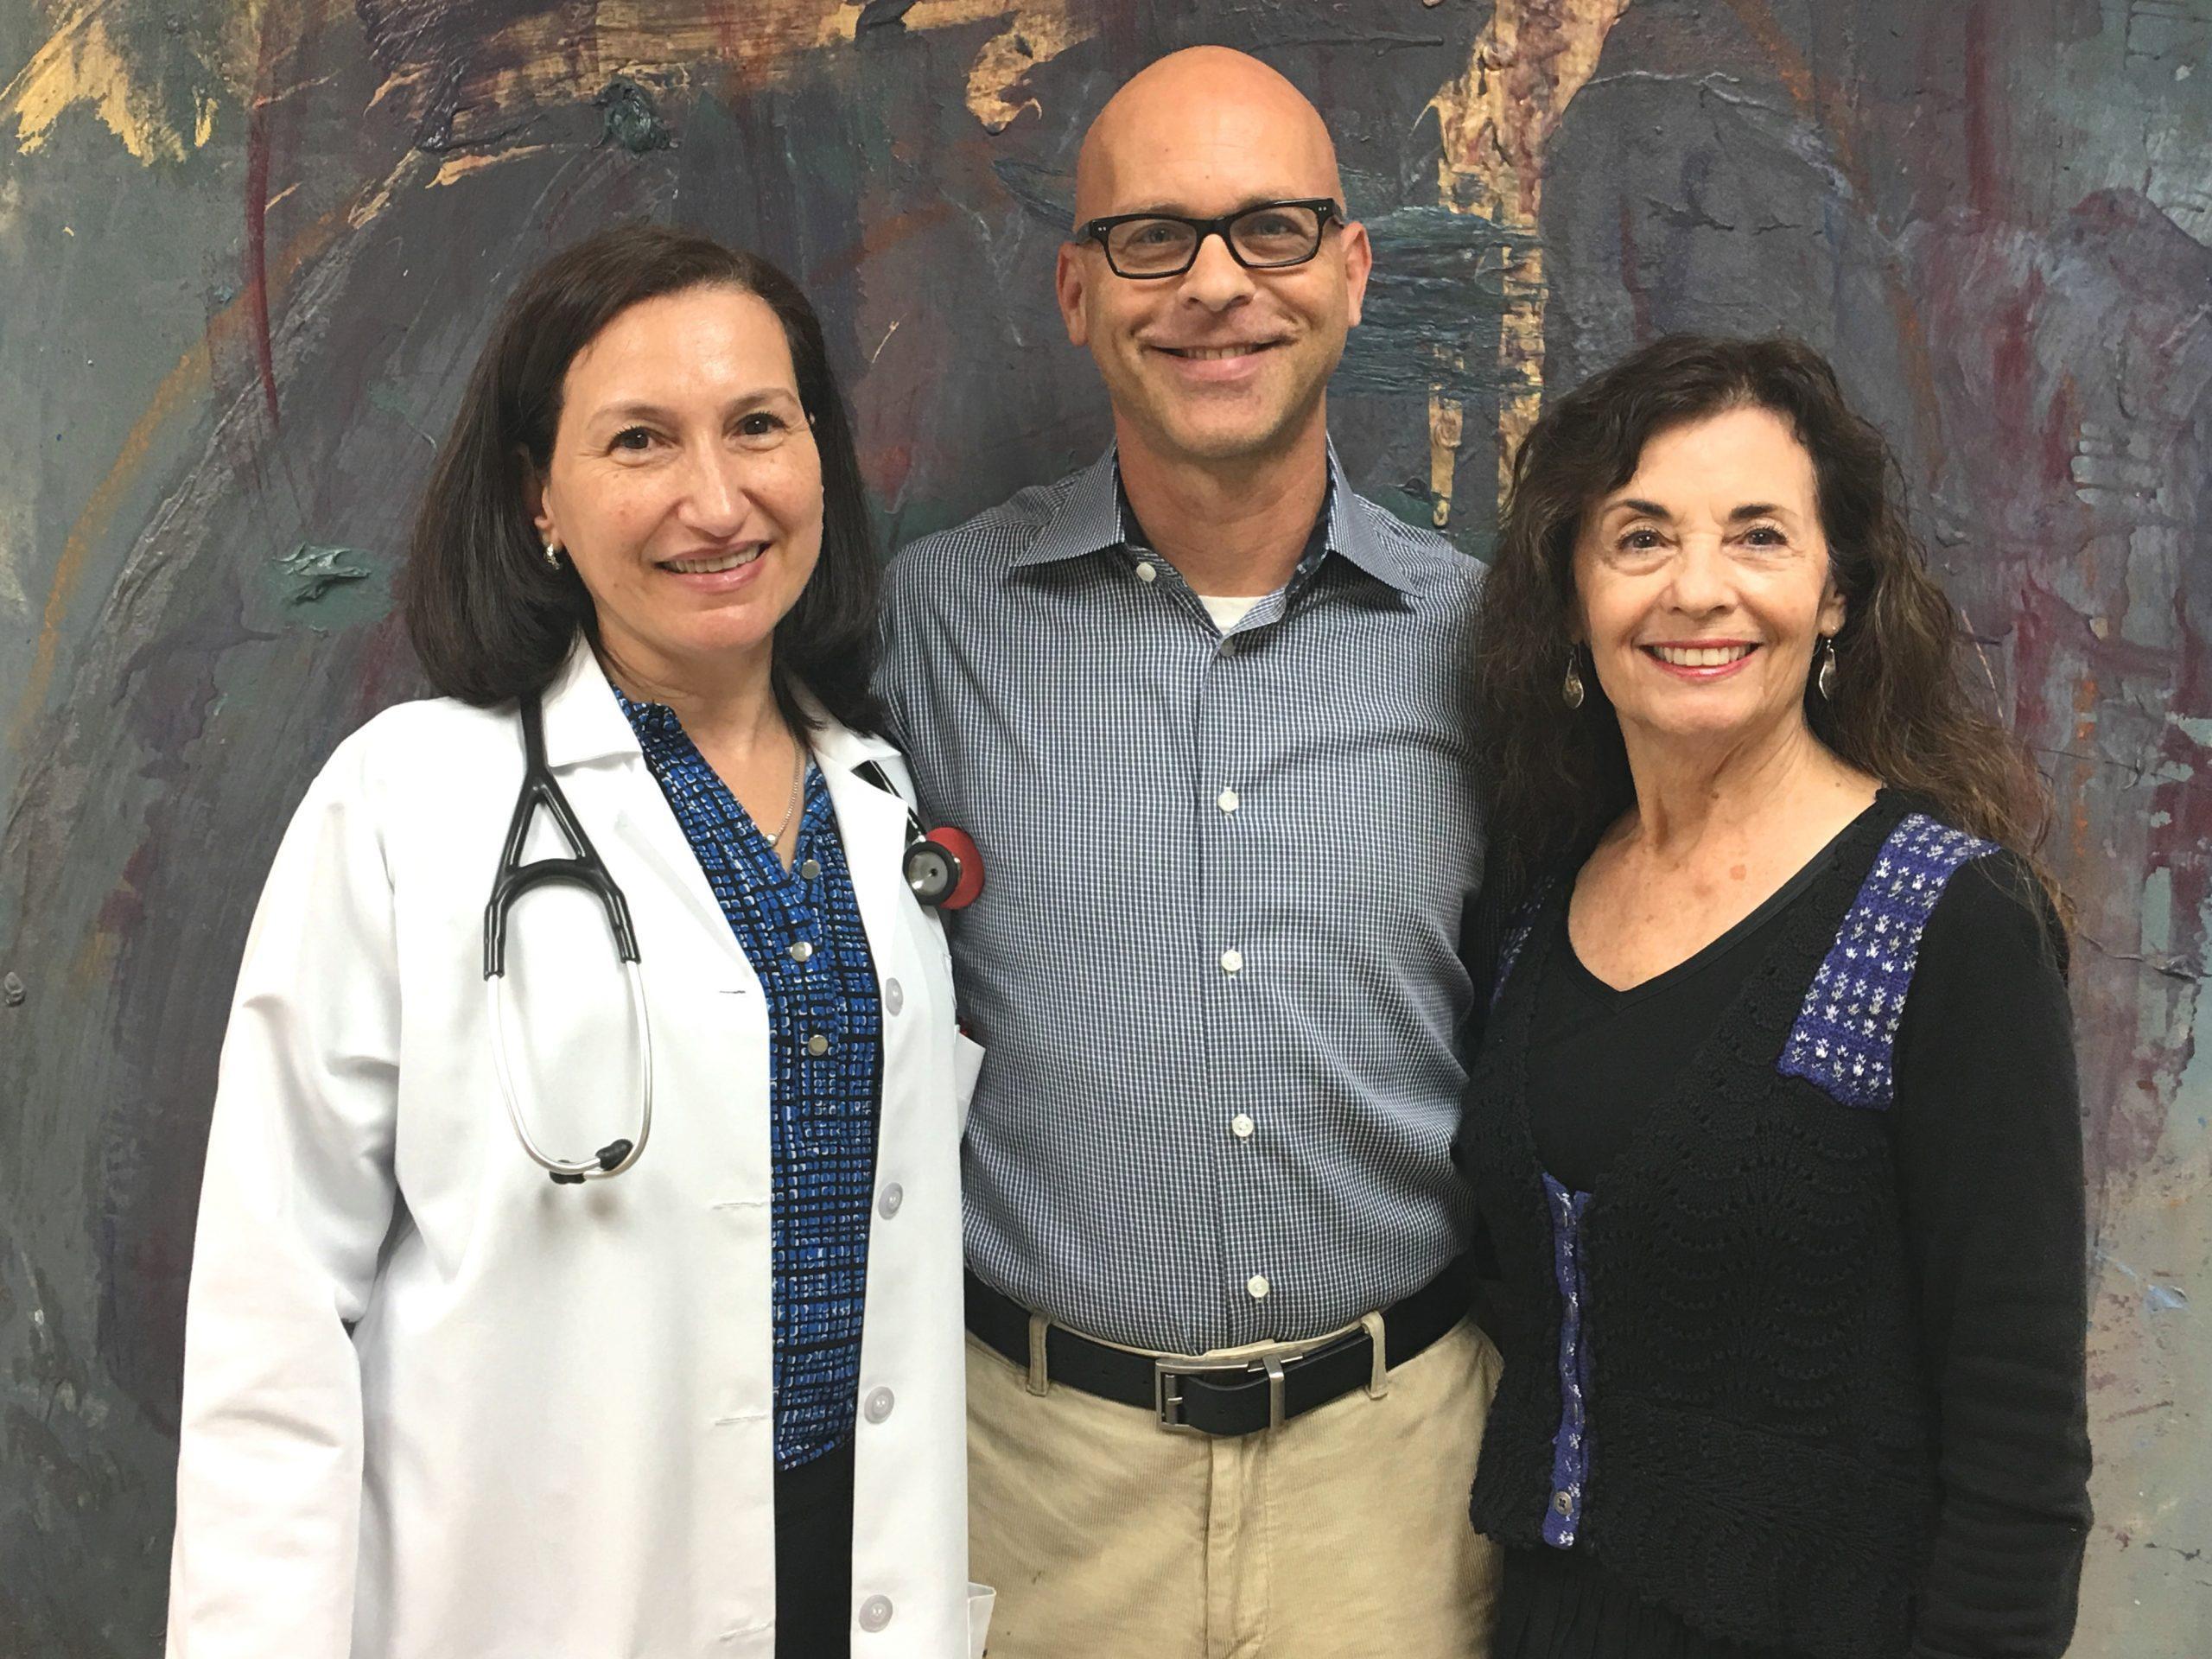 Photo: Dr. Lilian Zorilla, Rick St. Pierre and Christine Bonney